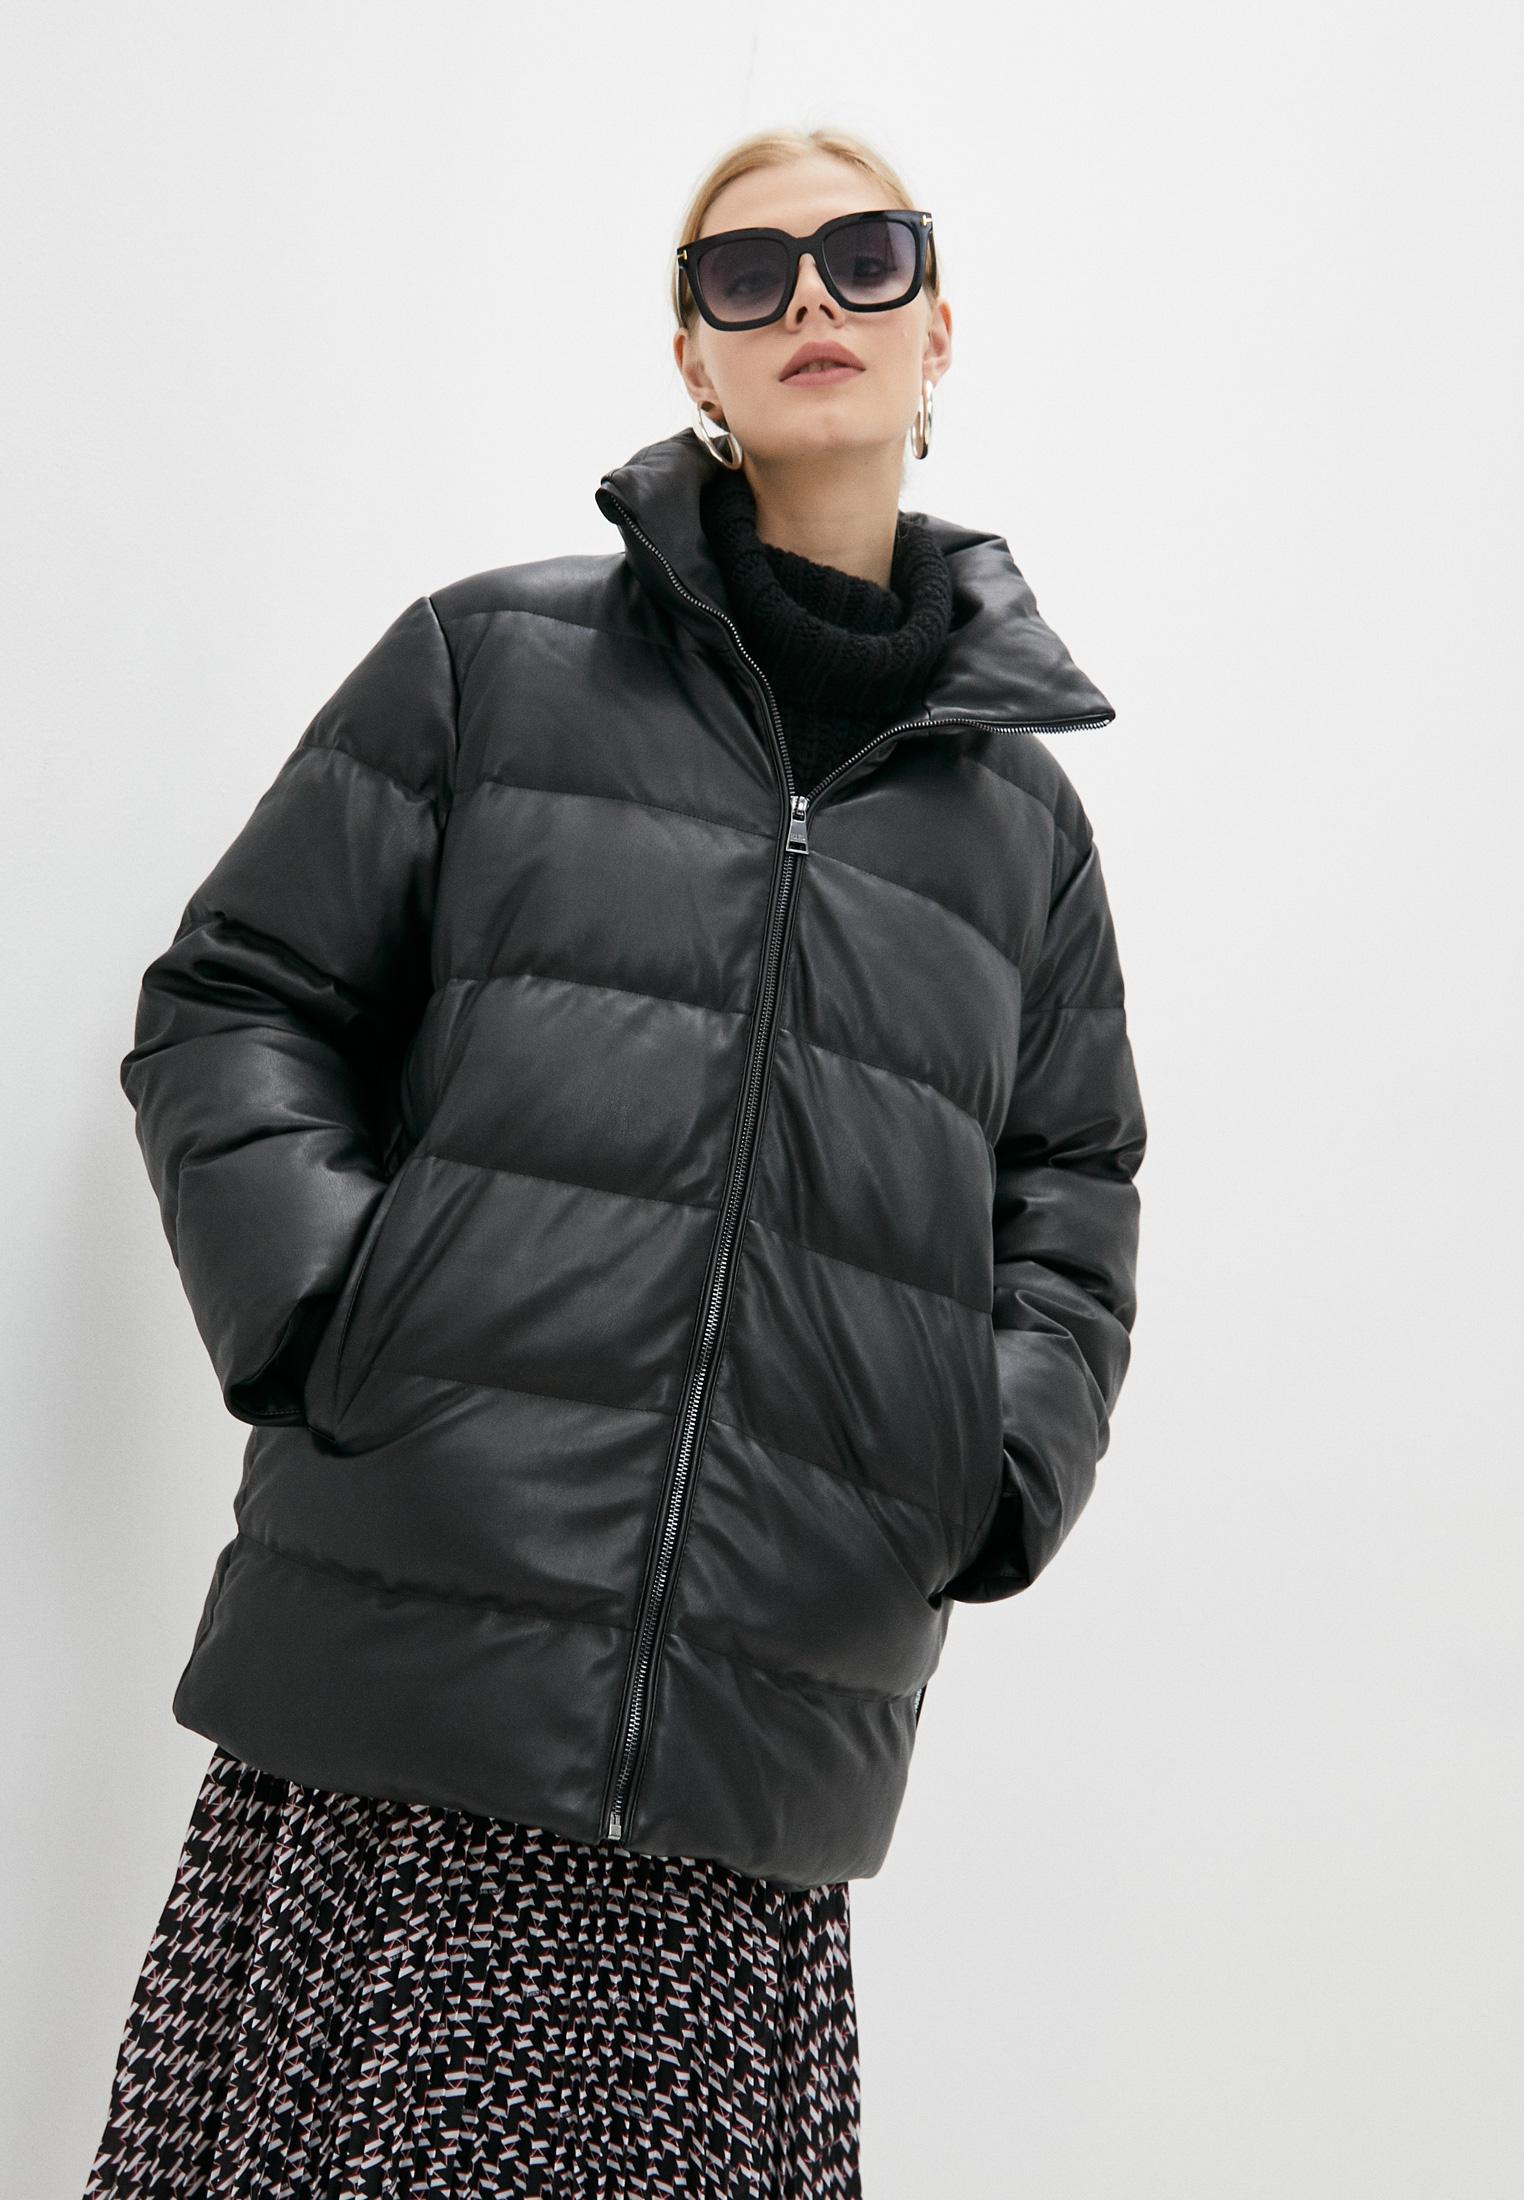 Кожаная куртка Karl Lagerfeld Куртка кожаная Karl Lagerfeld